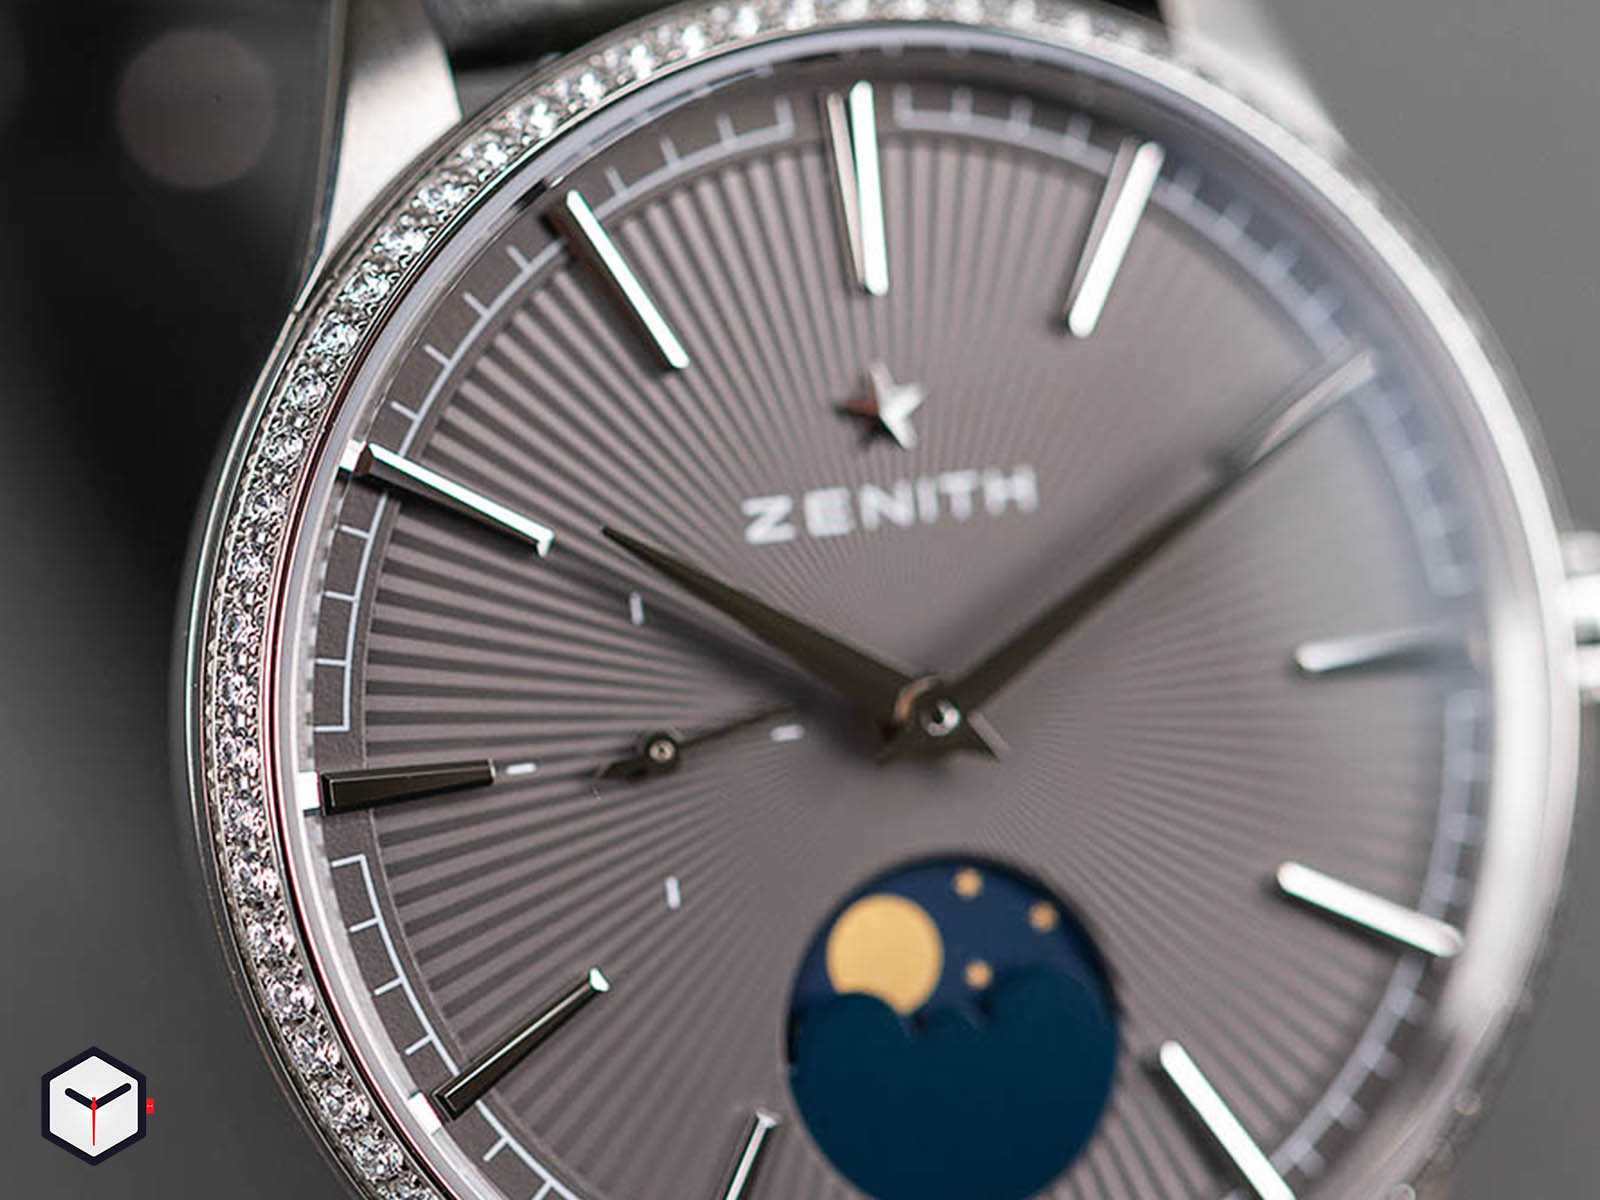 16-3200-692-03-c833-zenith-elite-moonphase-9.jpg